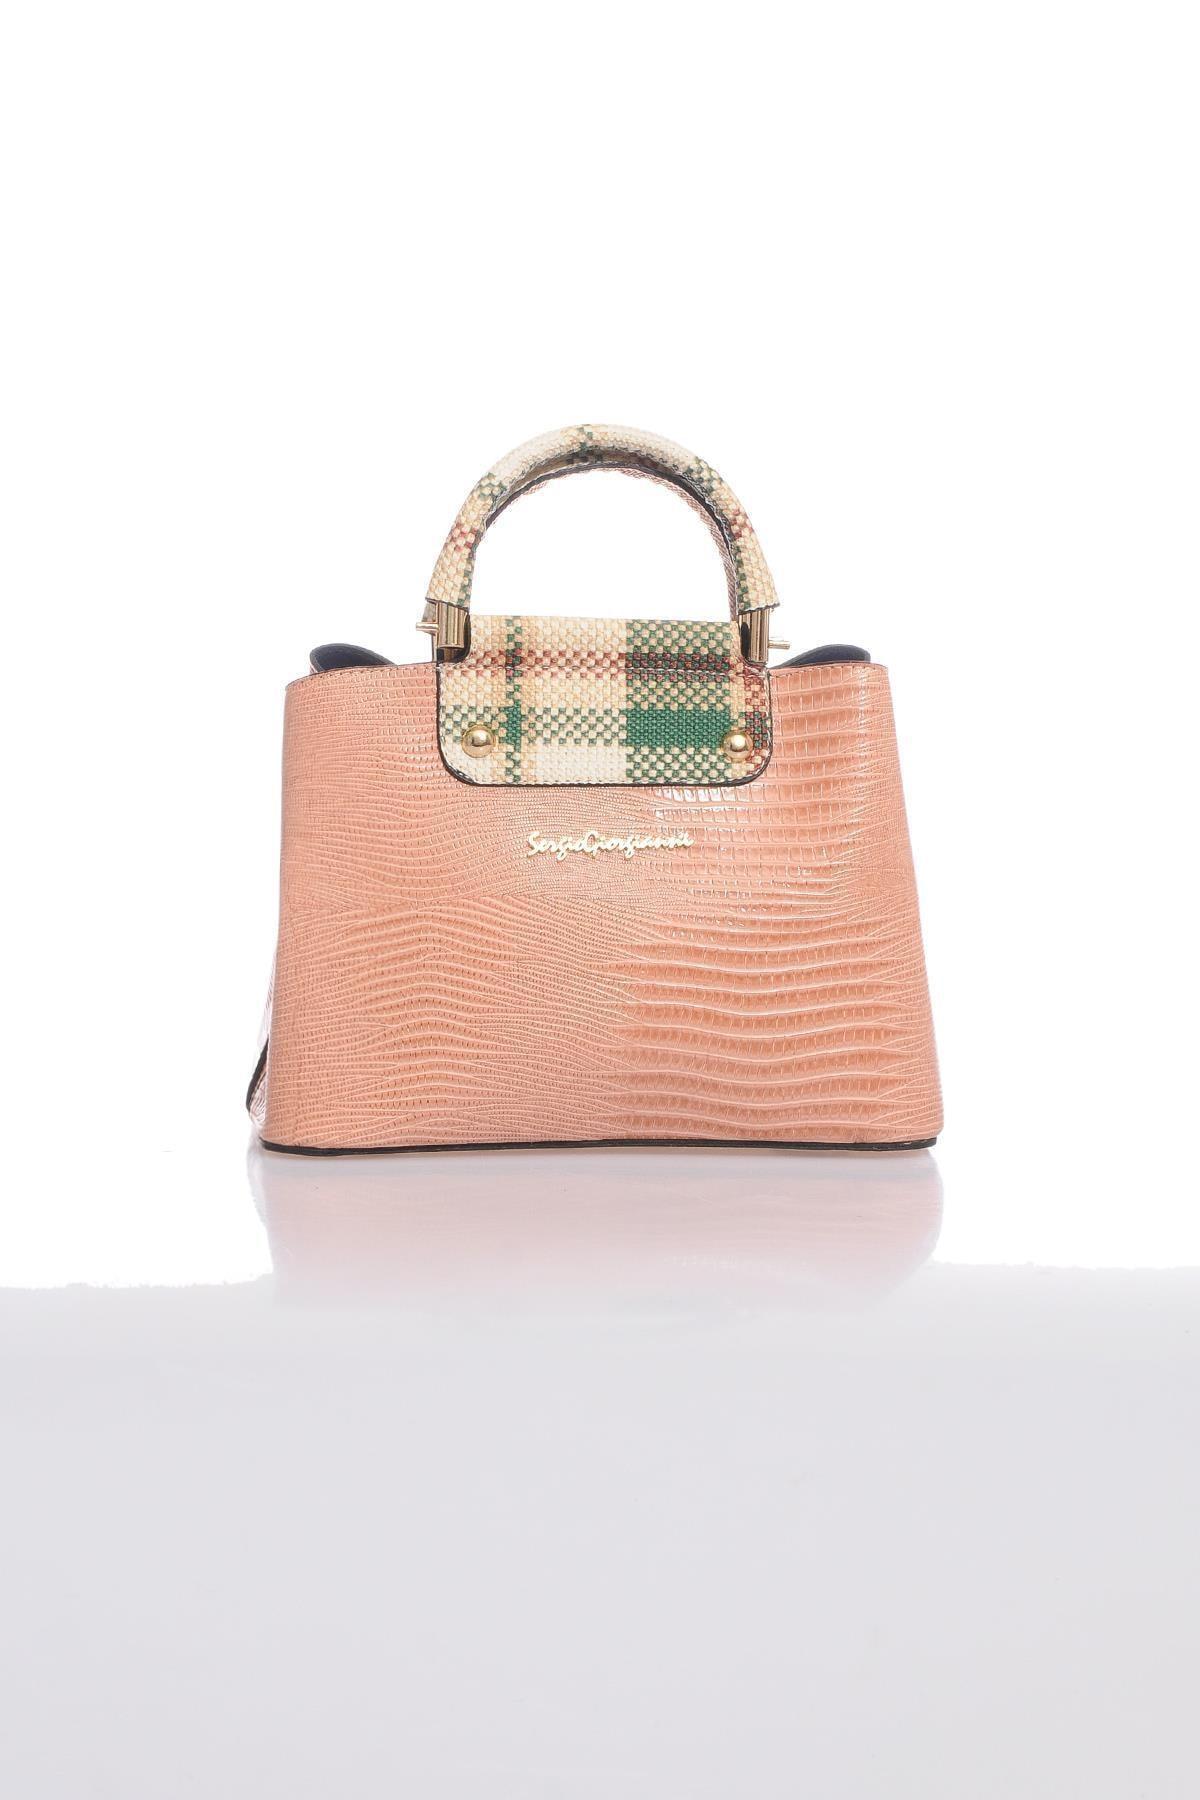 Sergio Giorgianni Luxury Sg0716 Pudra Kadın Omuz Çantası 1